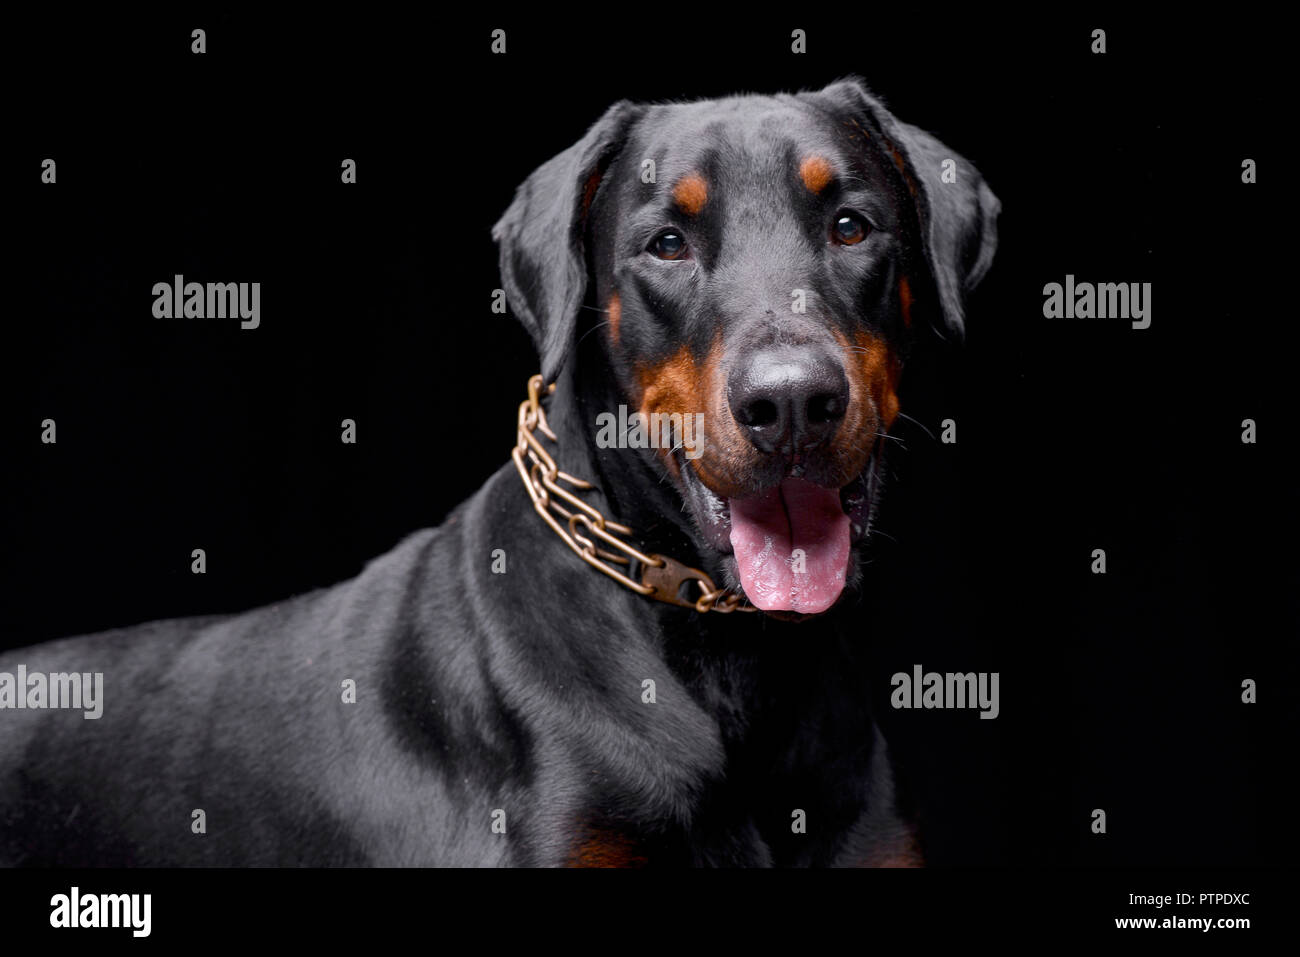 Portrait of an adorable Dobermann - studio shot, isolated on black. - Stock Image